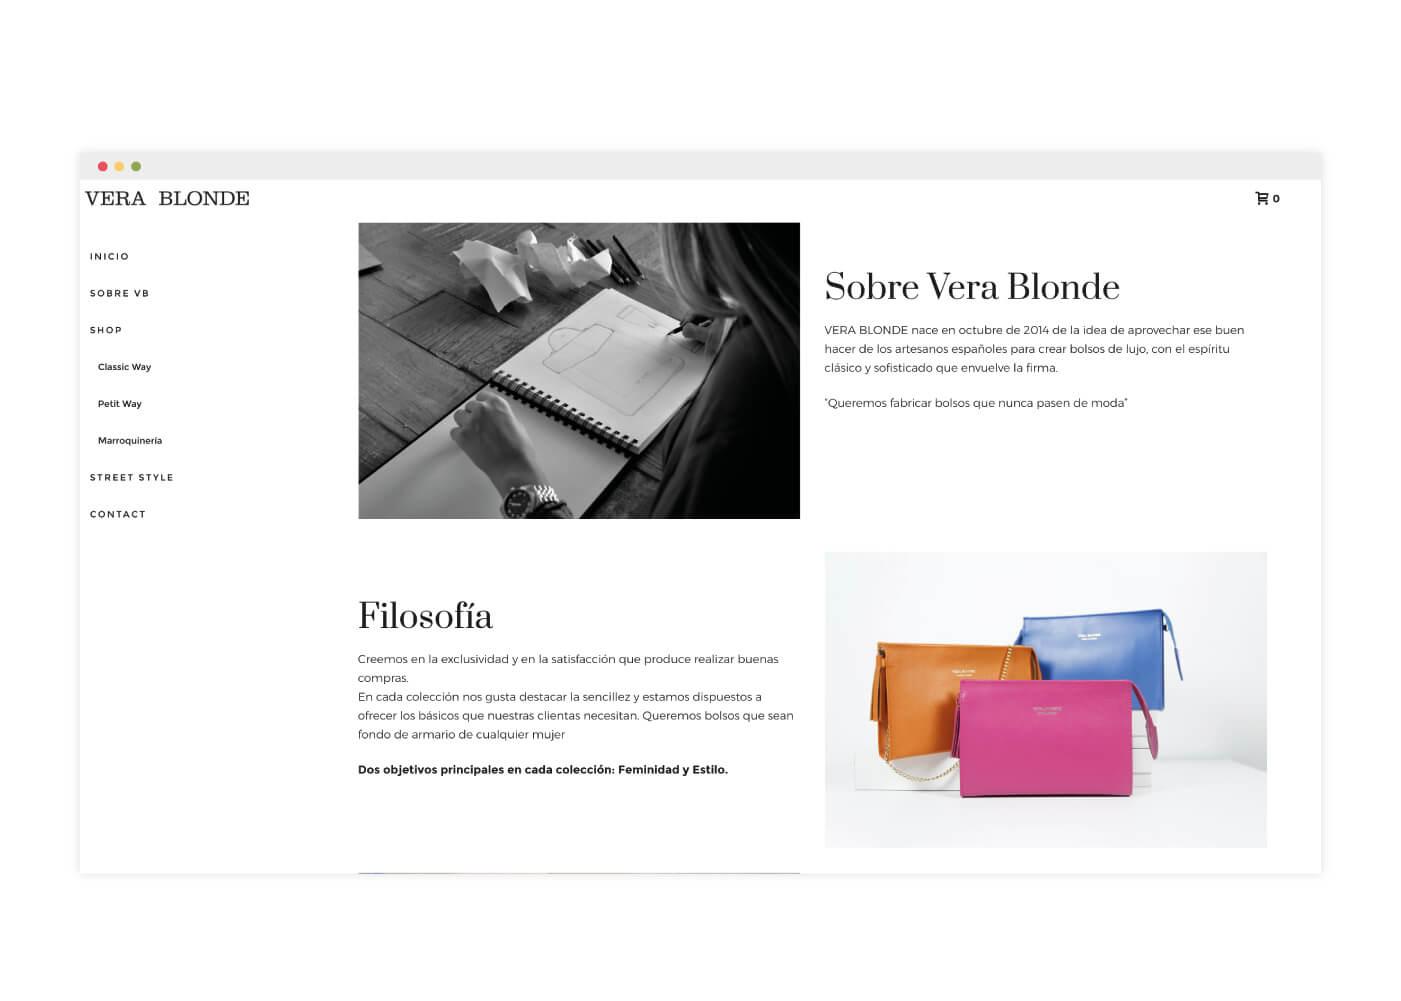 diseno-programacion-tienda-online-bolsos-vera-blonde-5